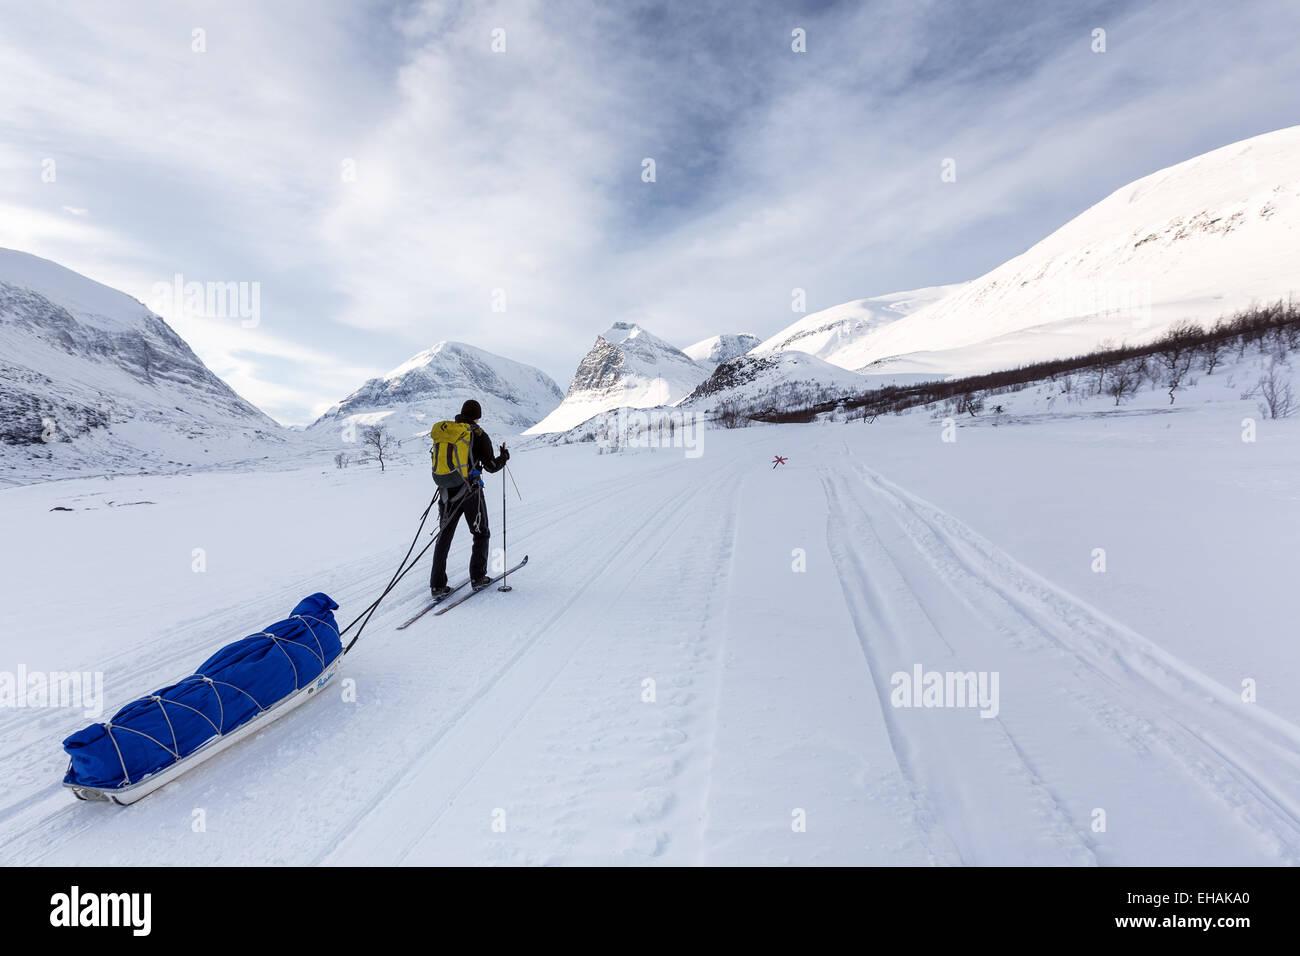 Skiing at Kebnekaise mountain area, Kiruna, Sweden, Europe, EU - Stock Image